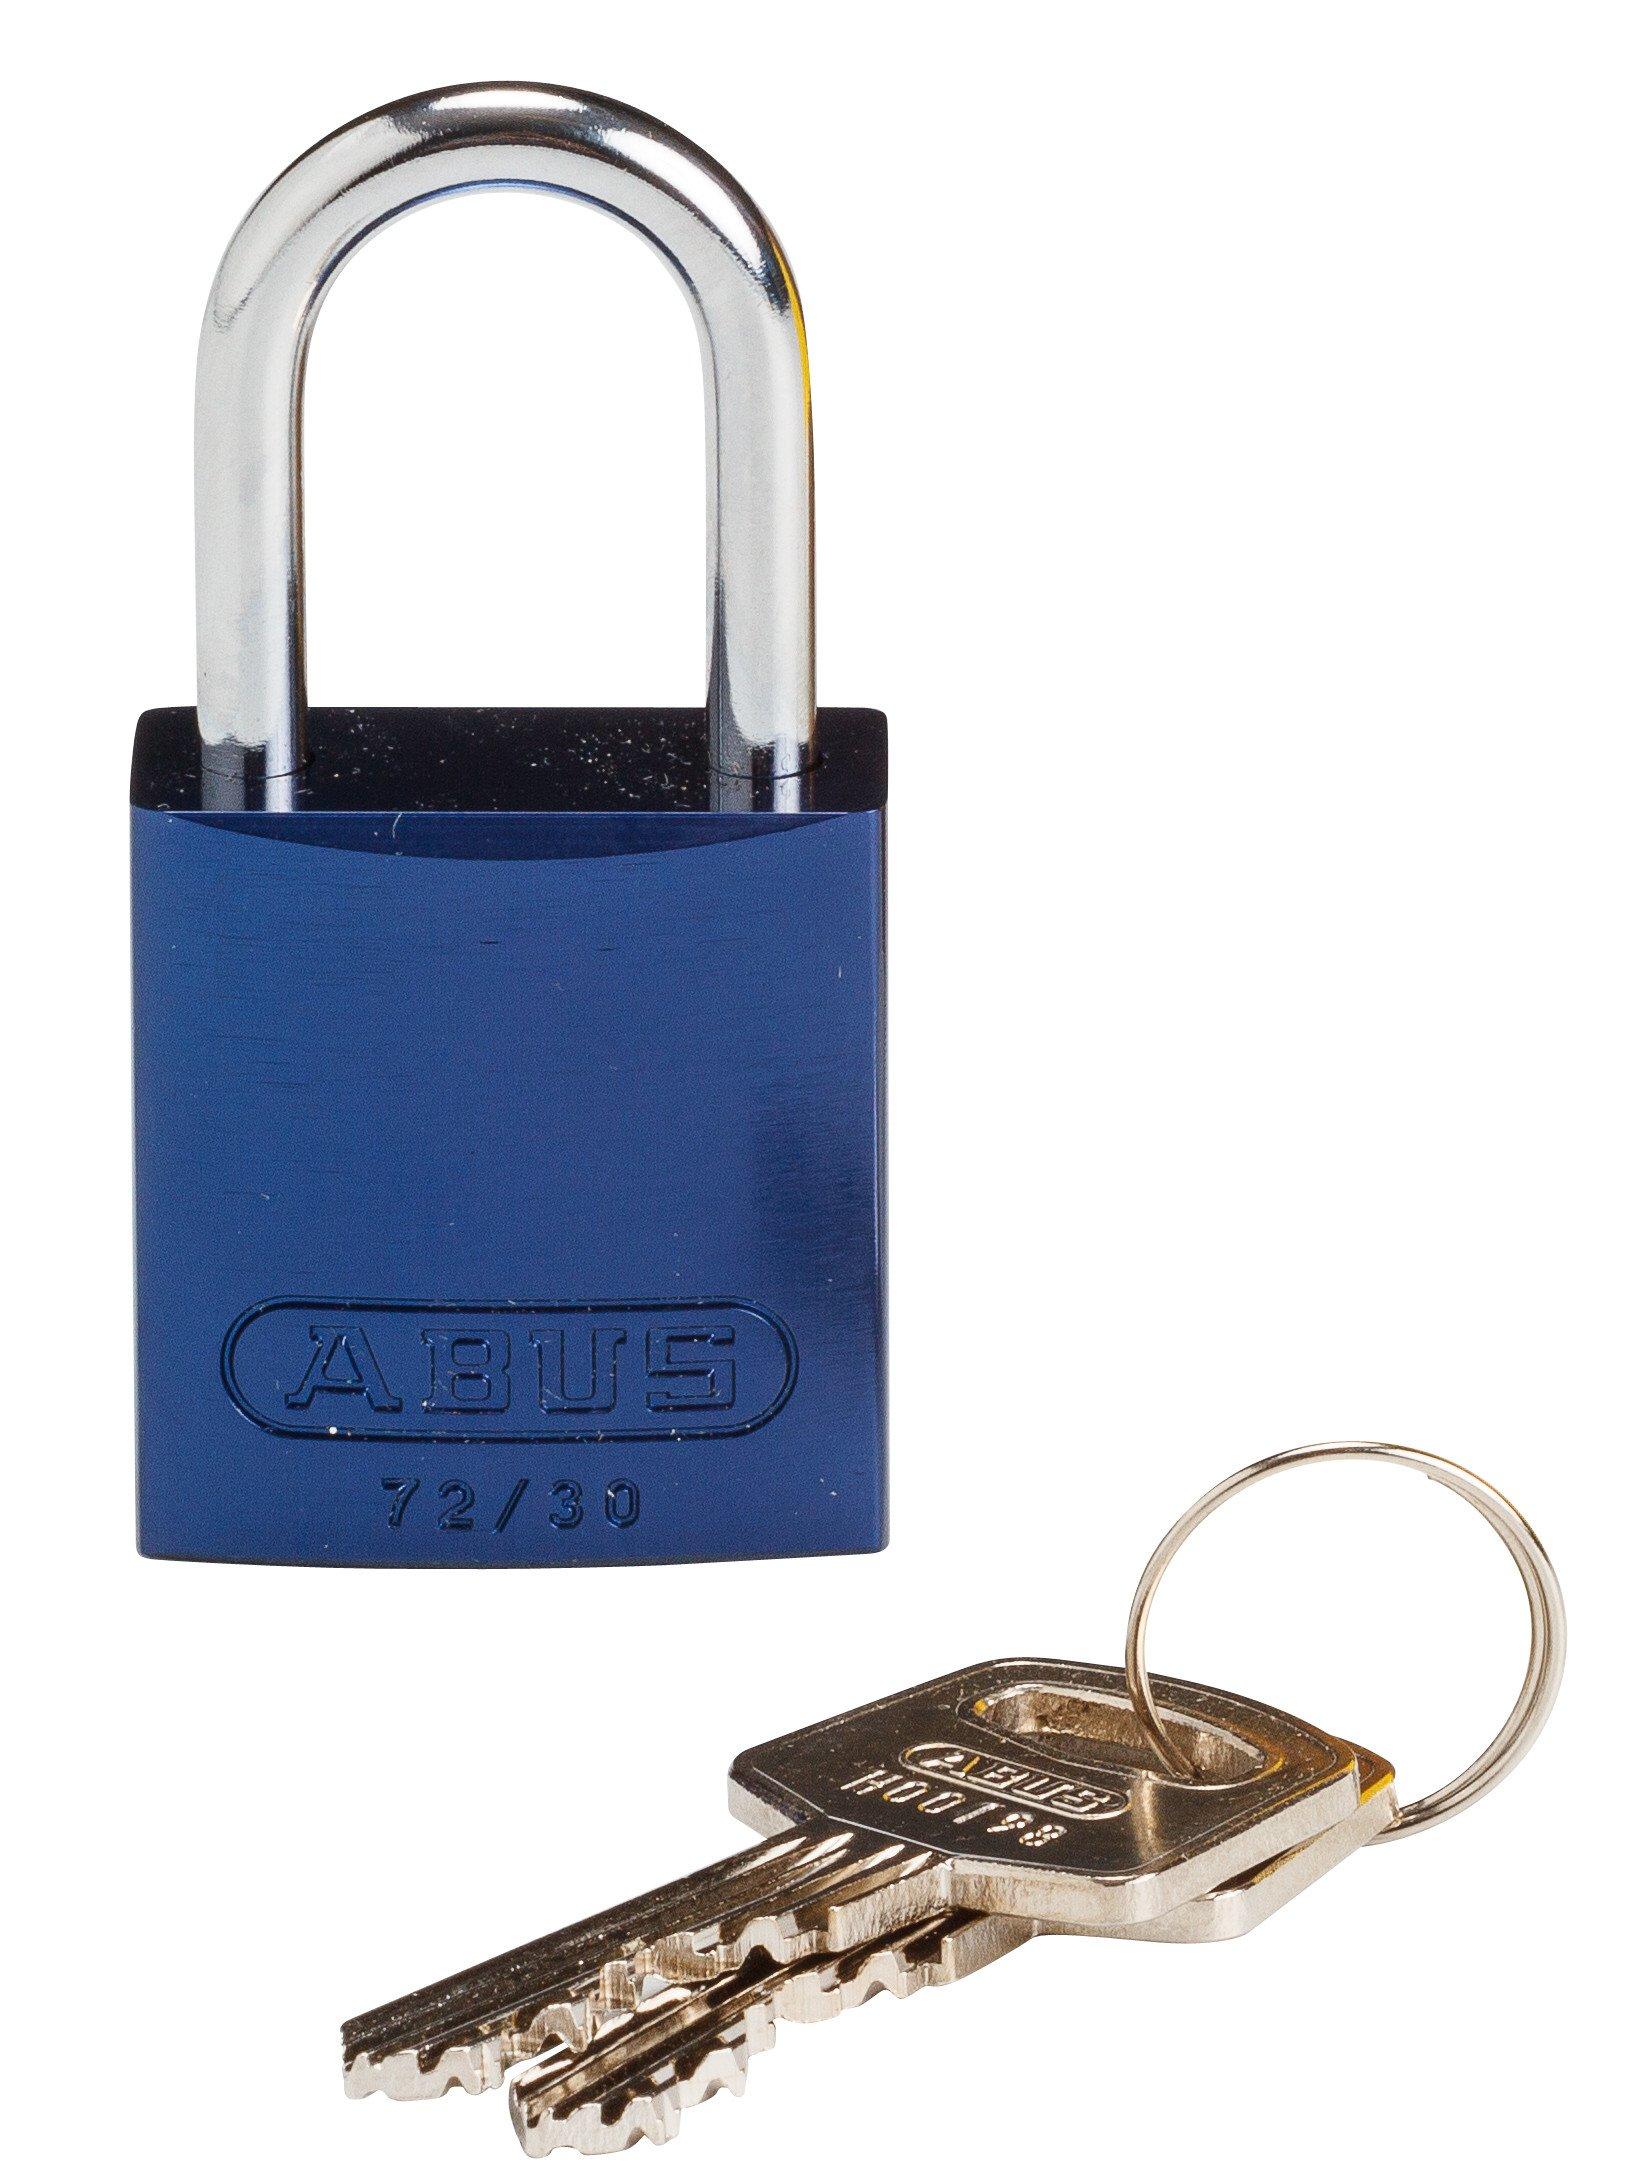 Brady 133271 Keyed Padlock, Different Key, Aluminum (Pack of 1)